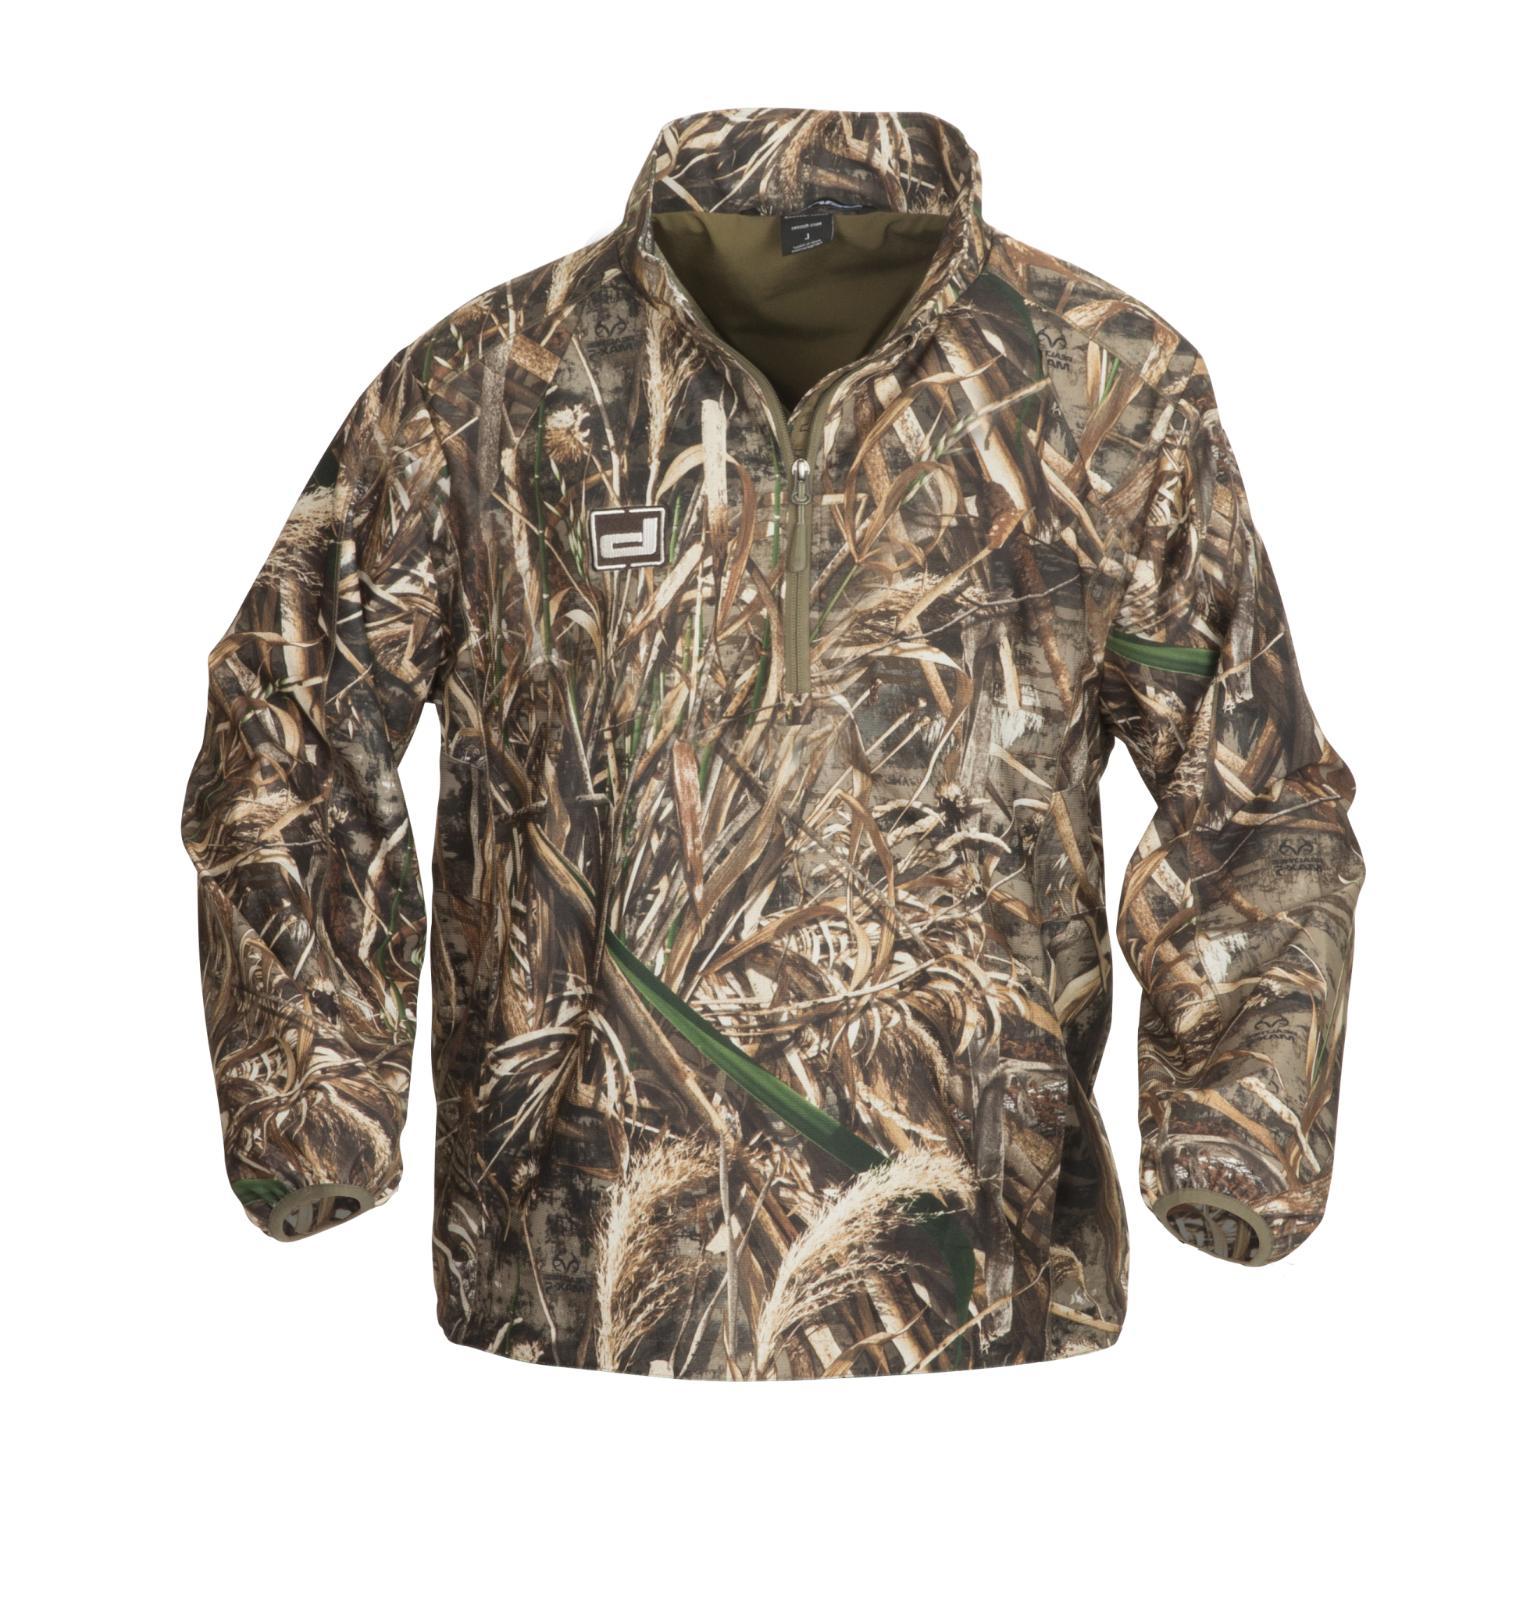 Banded Gear 1/4 Zip Pullover Jacket Windproof Coat MAX 5 Cam